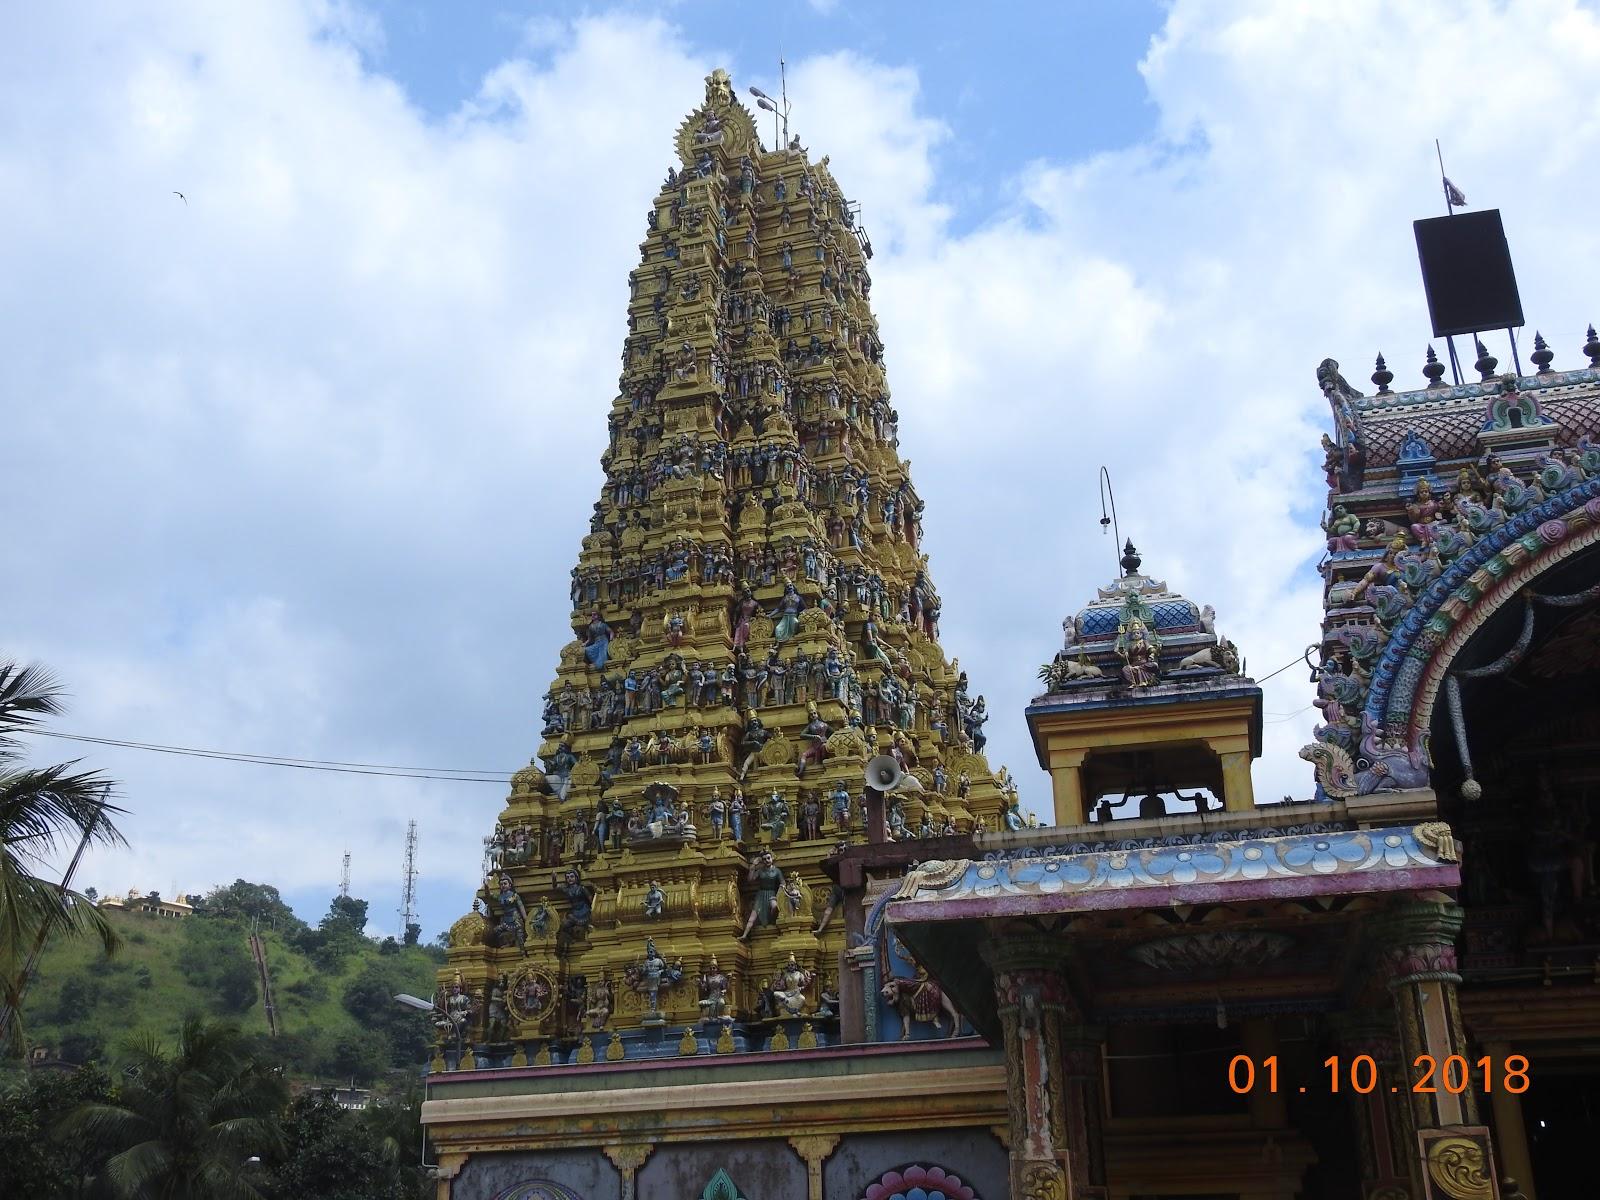 invite-to-paradise-sri-lanka-maldives-holiday-specialists-nutan-vidyut-patel-temple-3.jpg